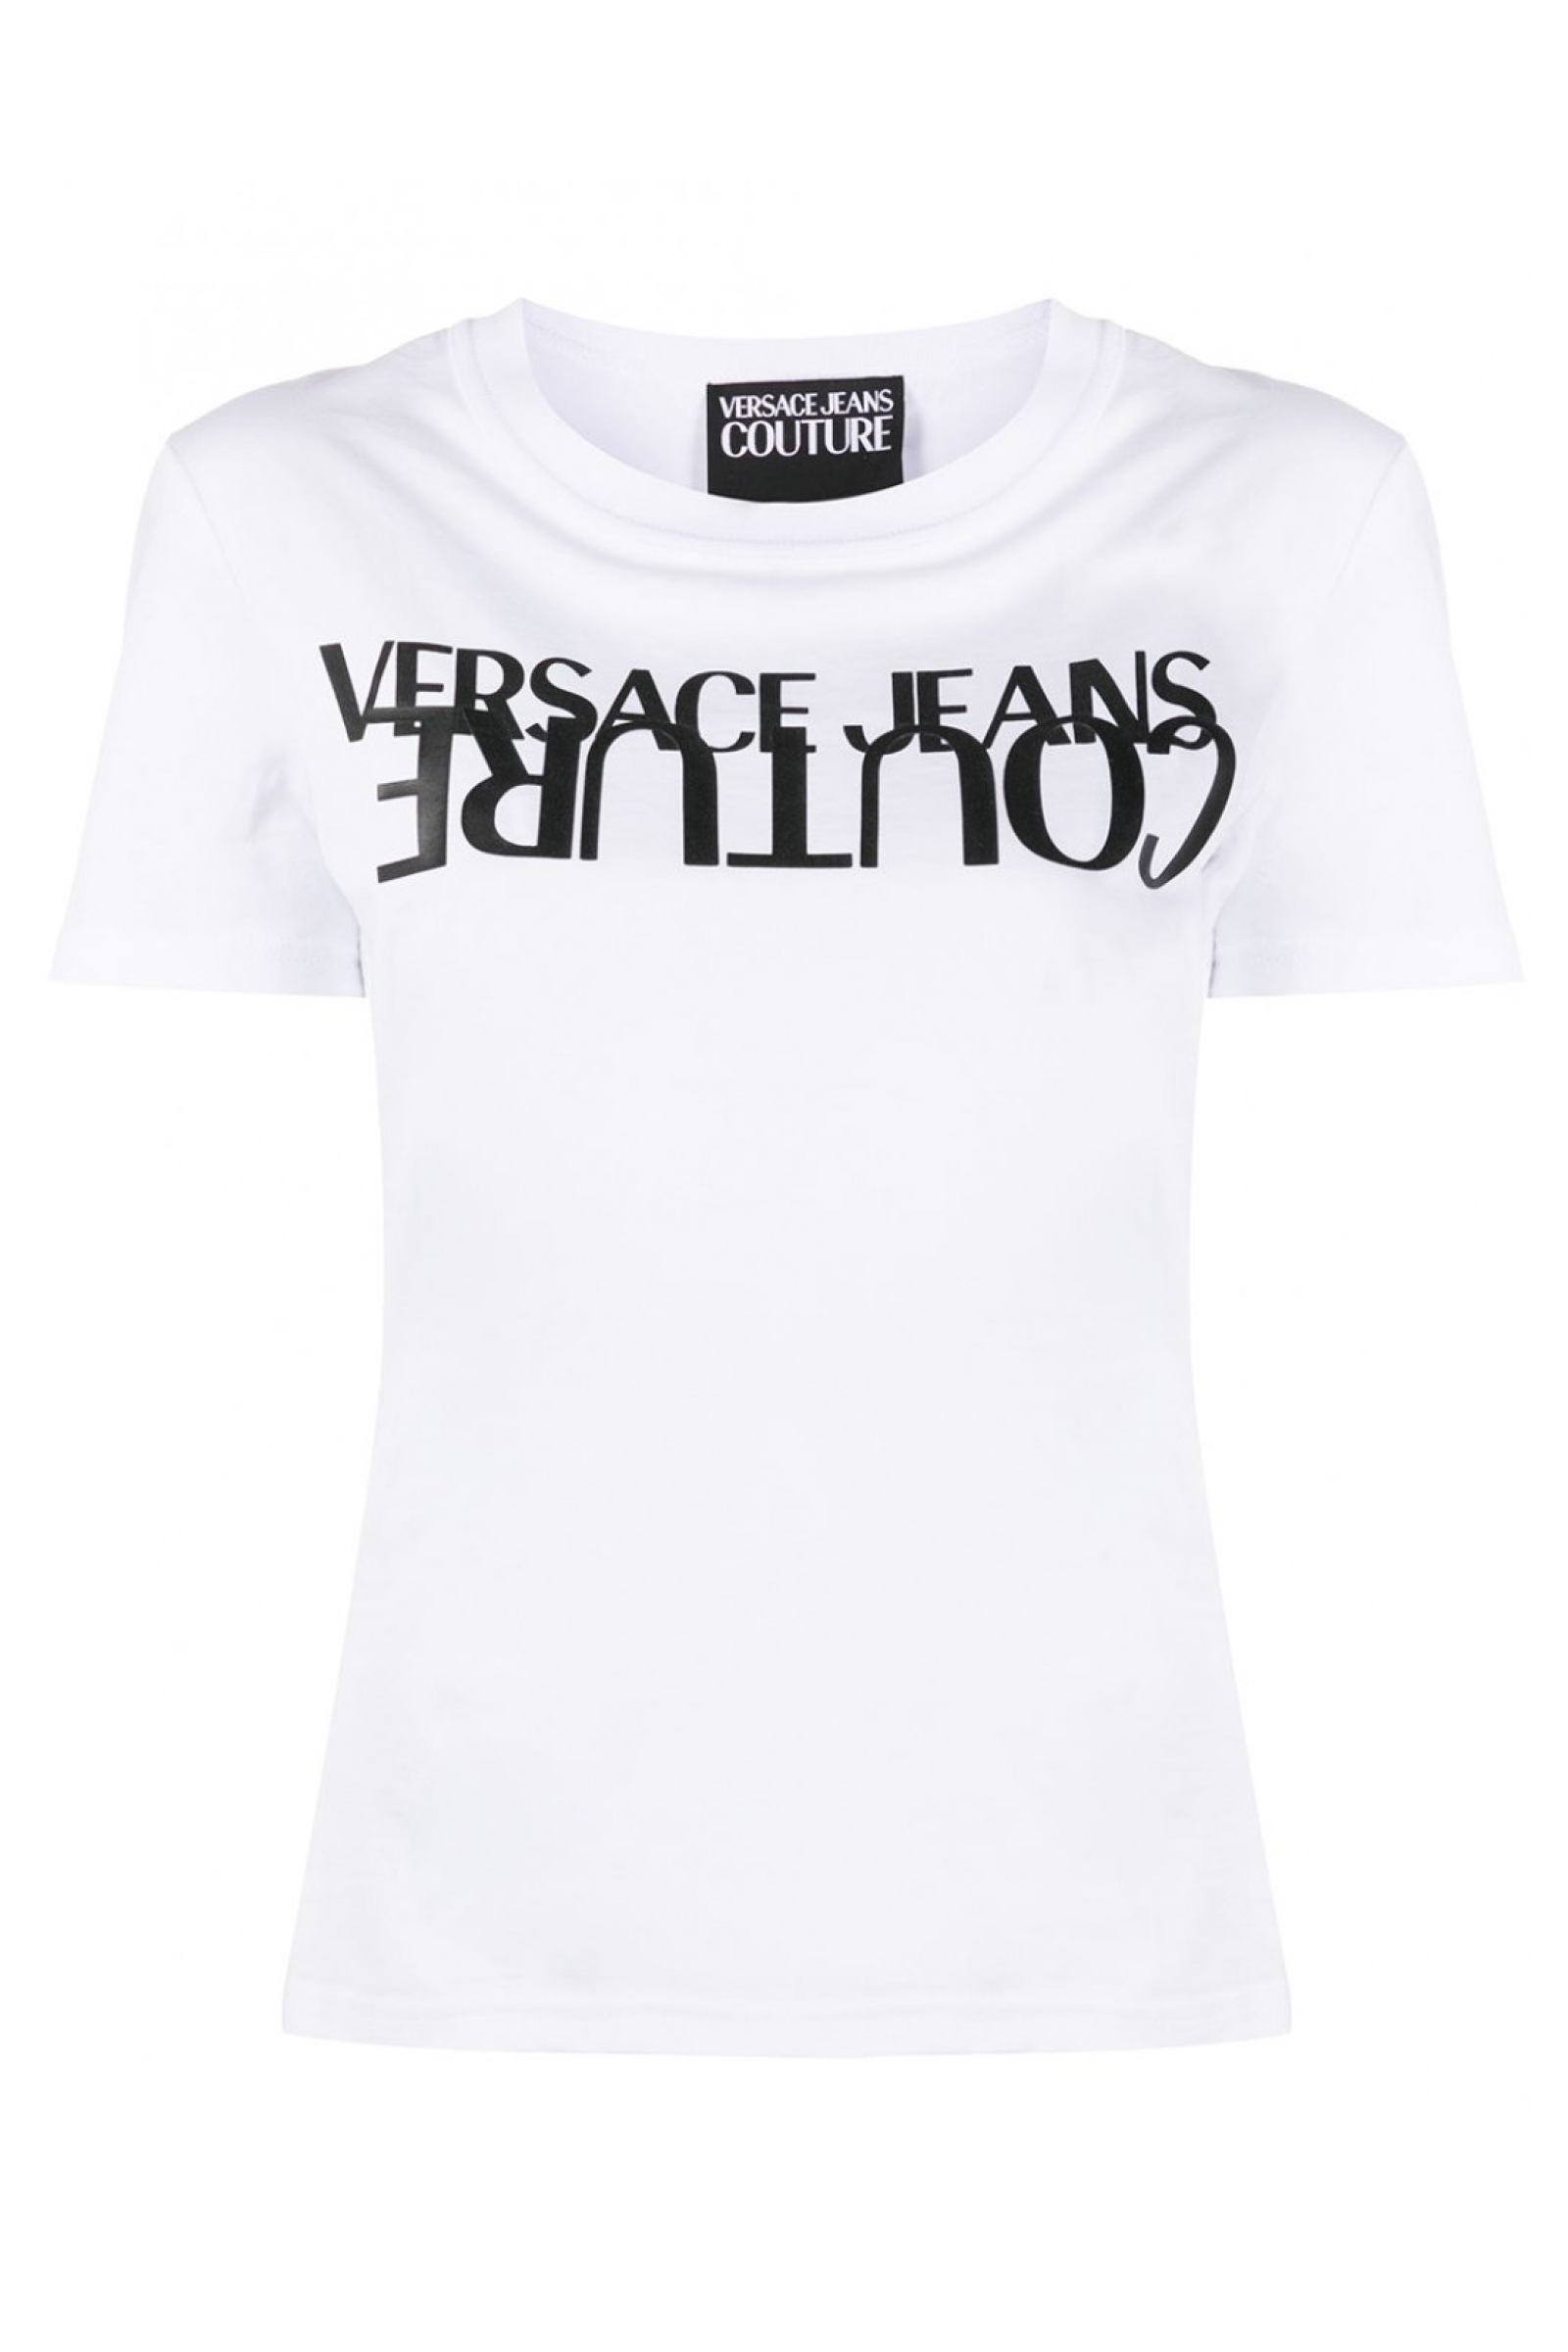 VERSACE JEANS COUTURE VERSACE JEANS COUTURE | T-Shirt | B2HZA7KB.30327003 ZDP608